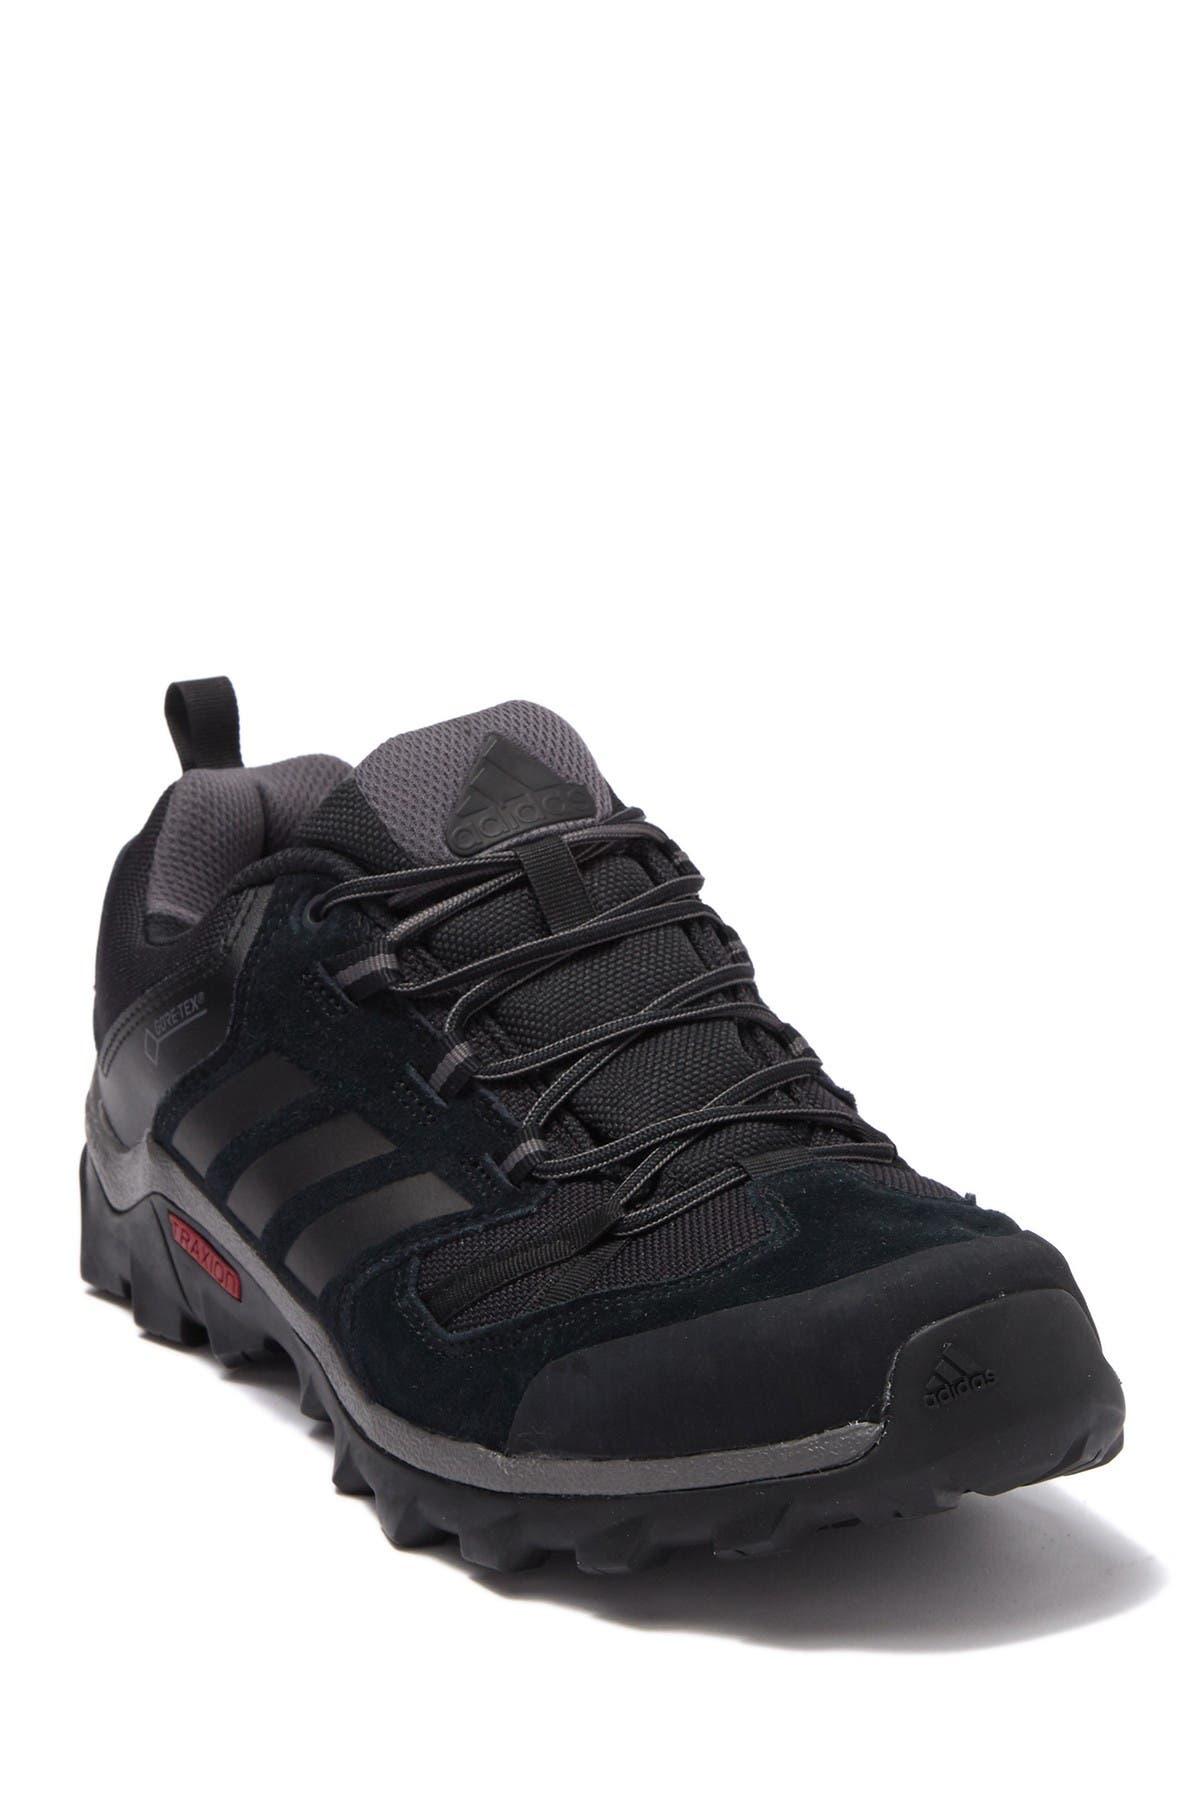 adidas | Caprock GTX Hiking Sneaker